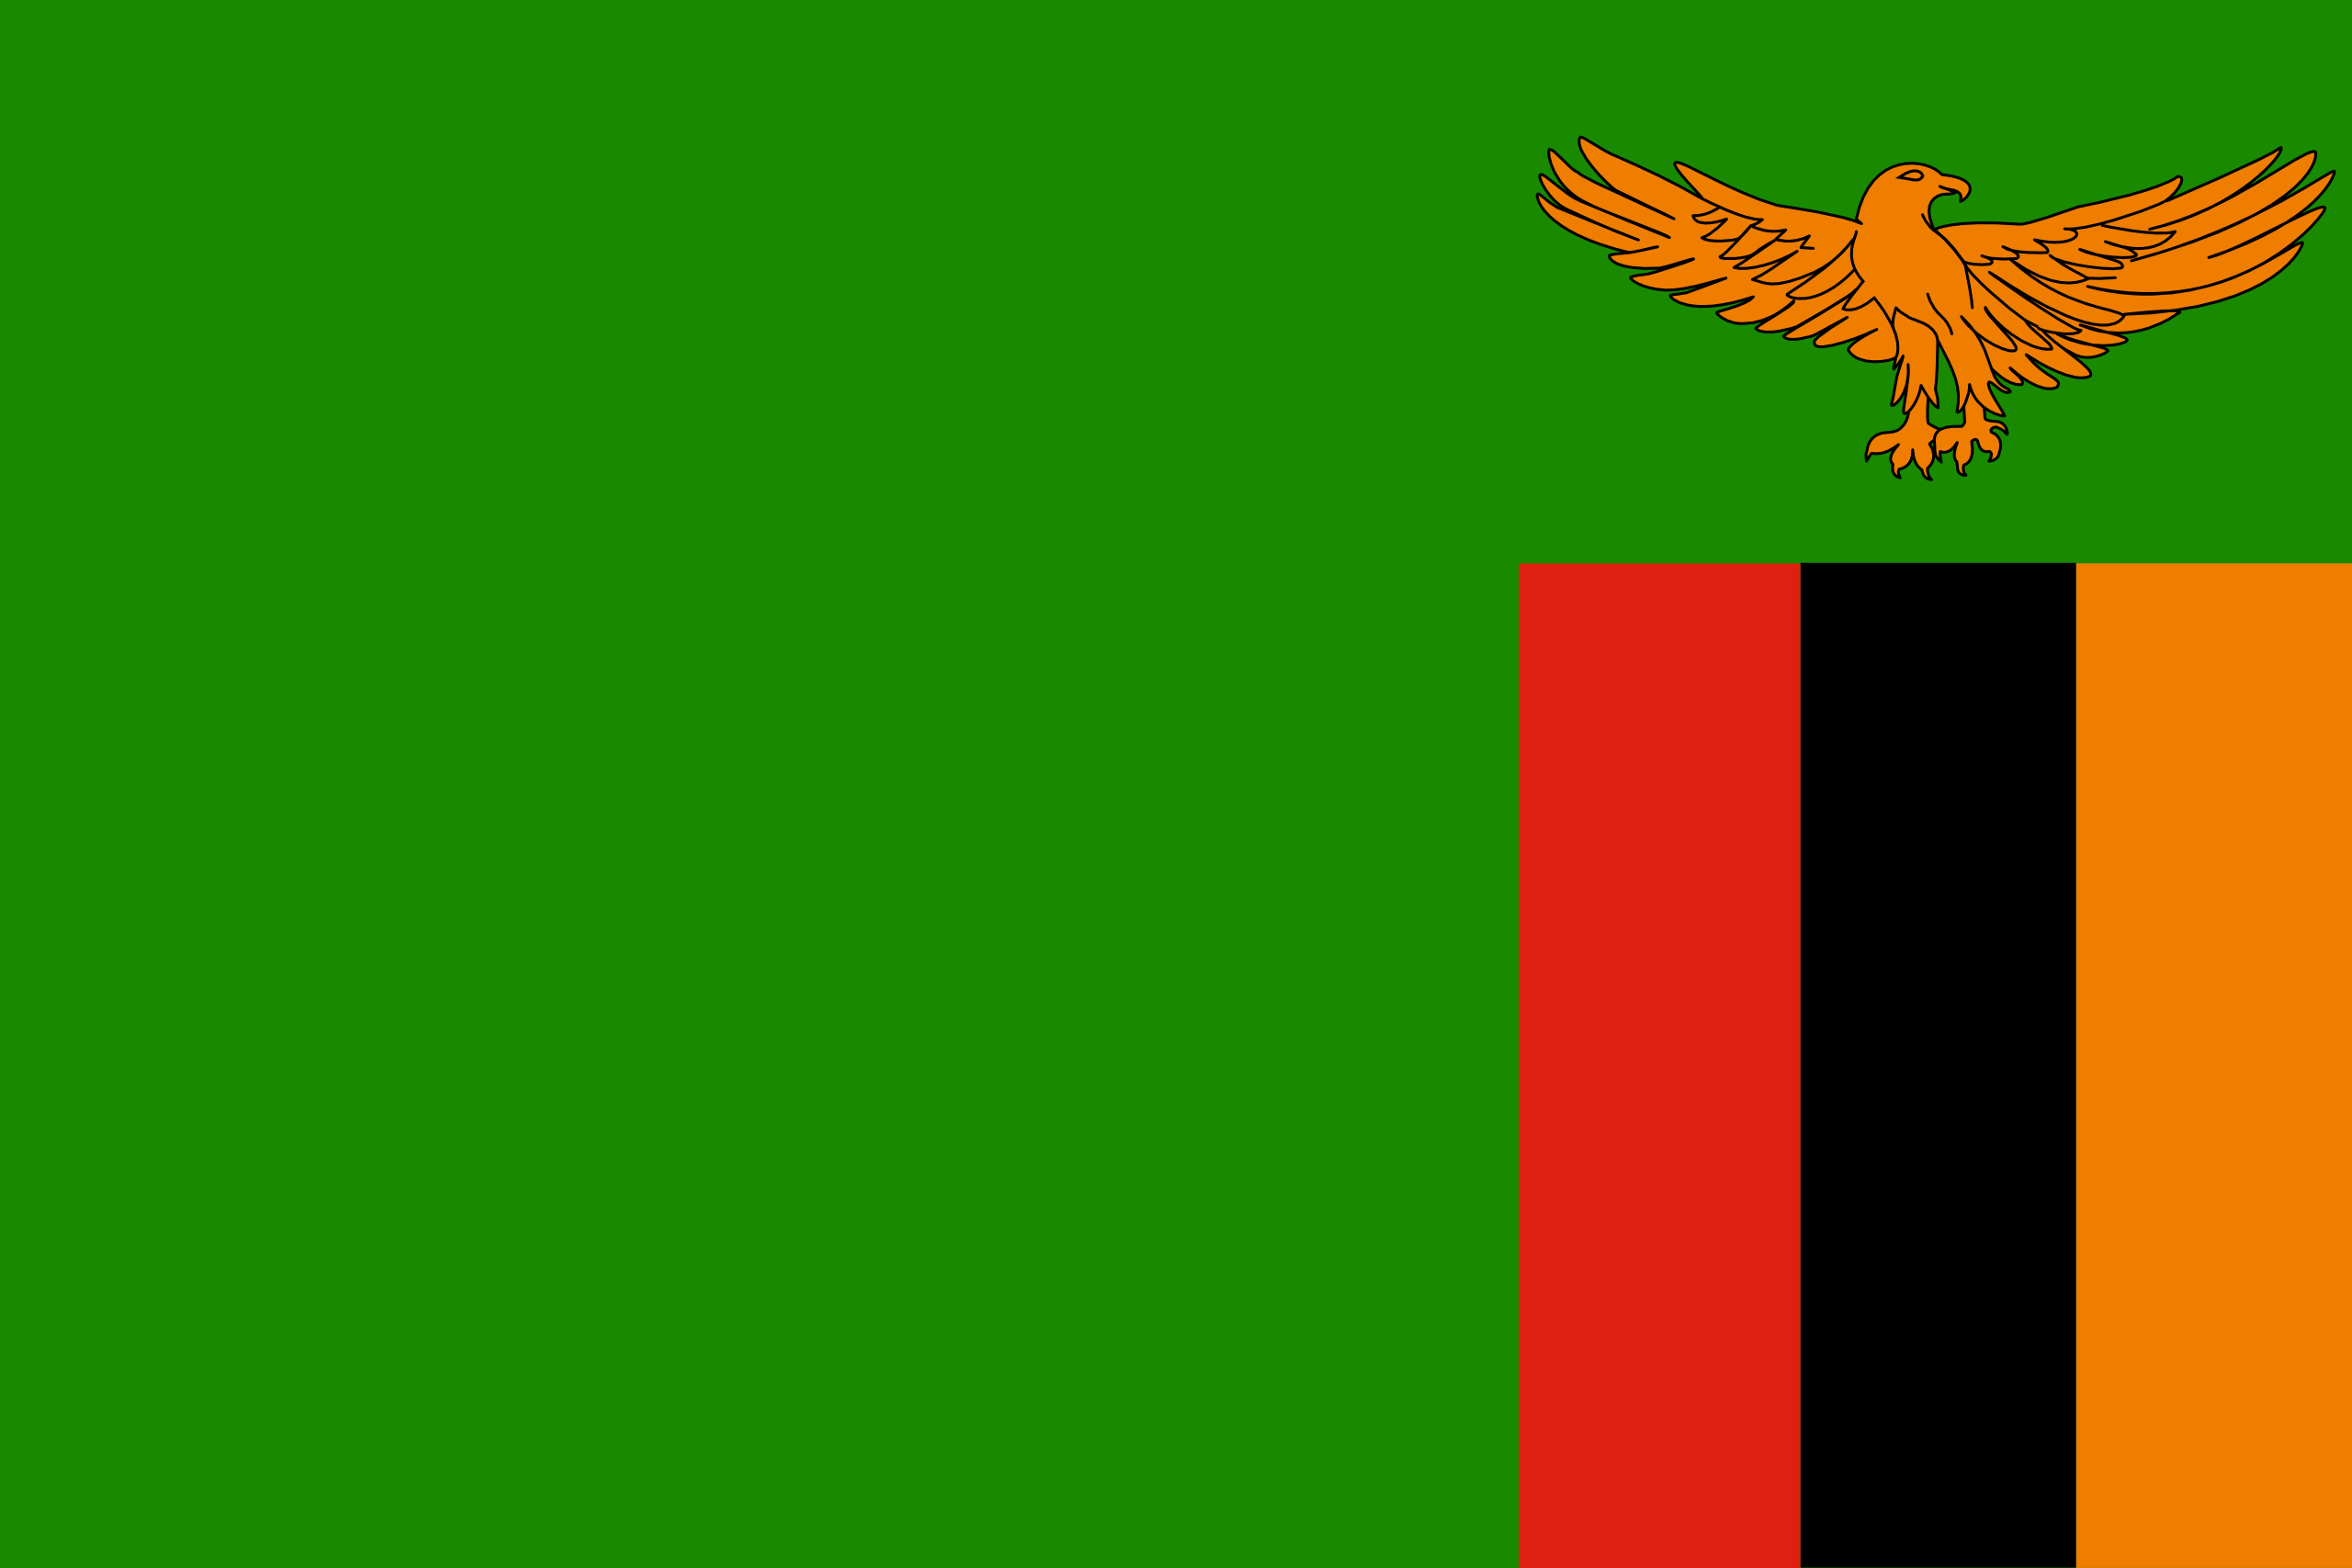 Замбия, страна, Эмблема, логотип, символ - Обои HD - Профессор falken.com